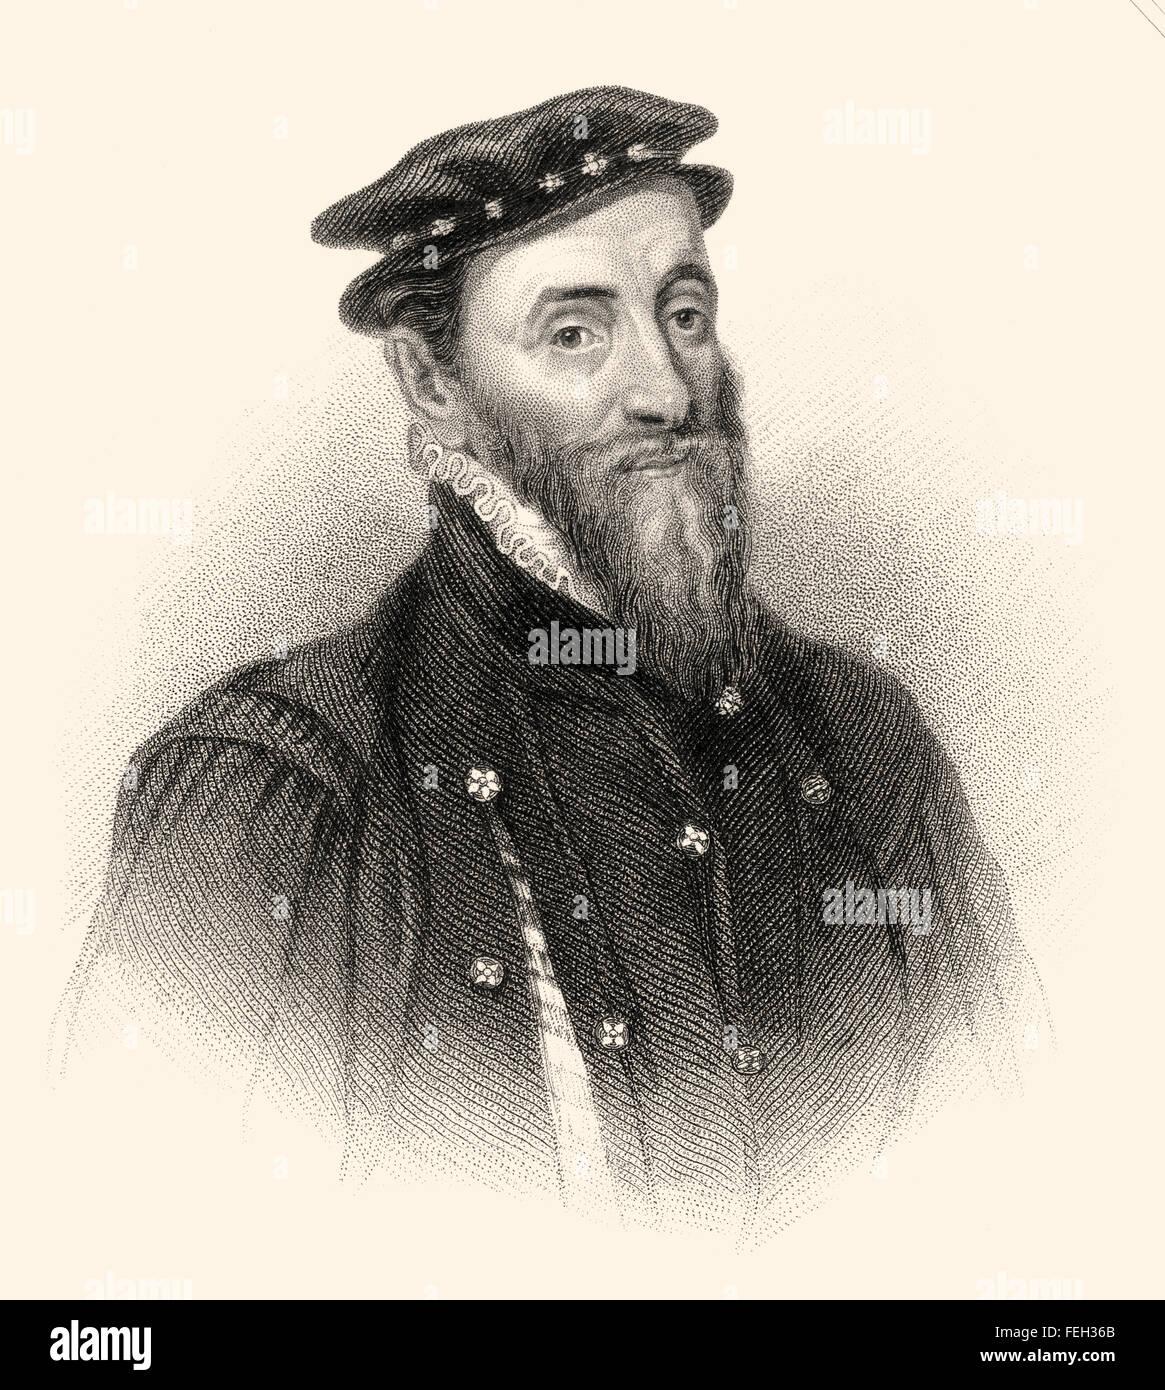 Sir Thomas Gresham the Elder, 1519-1579, an English merchant and financier - Stock Image